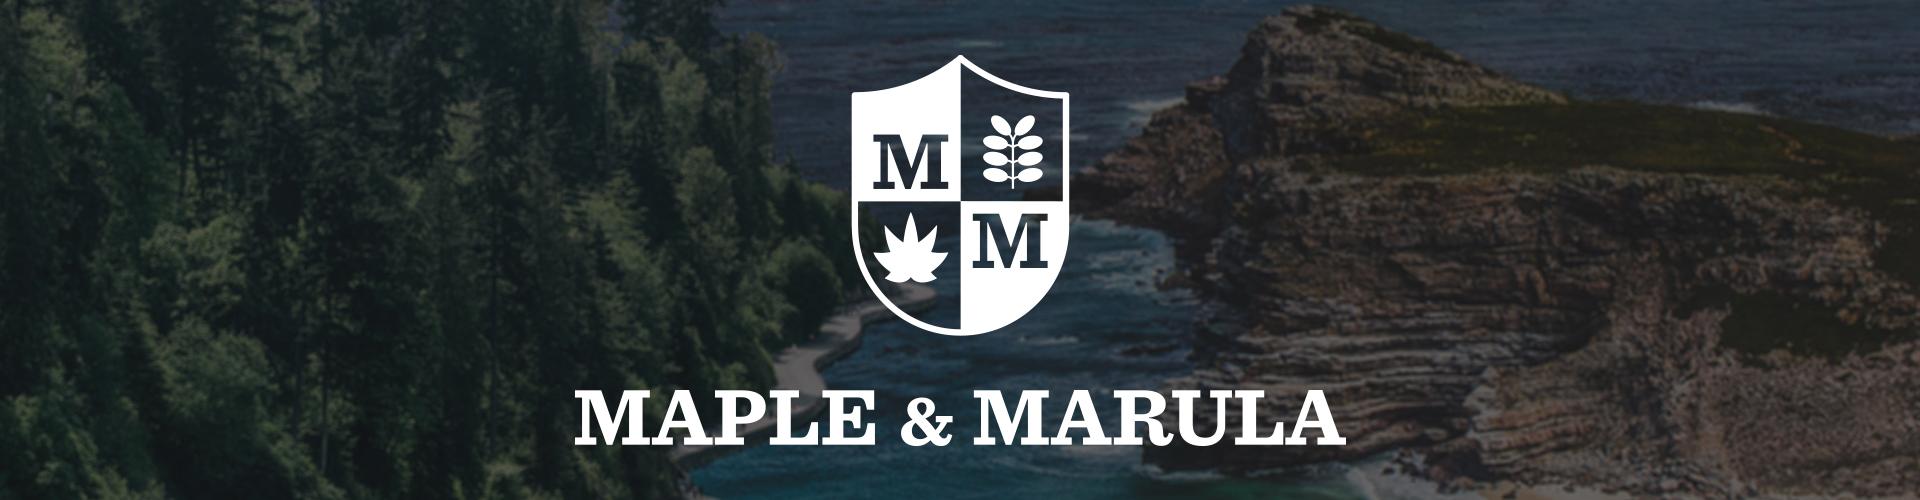 Maple and Marula